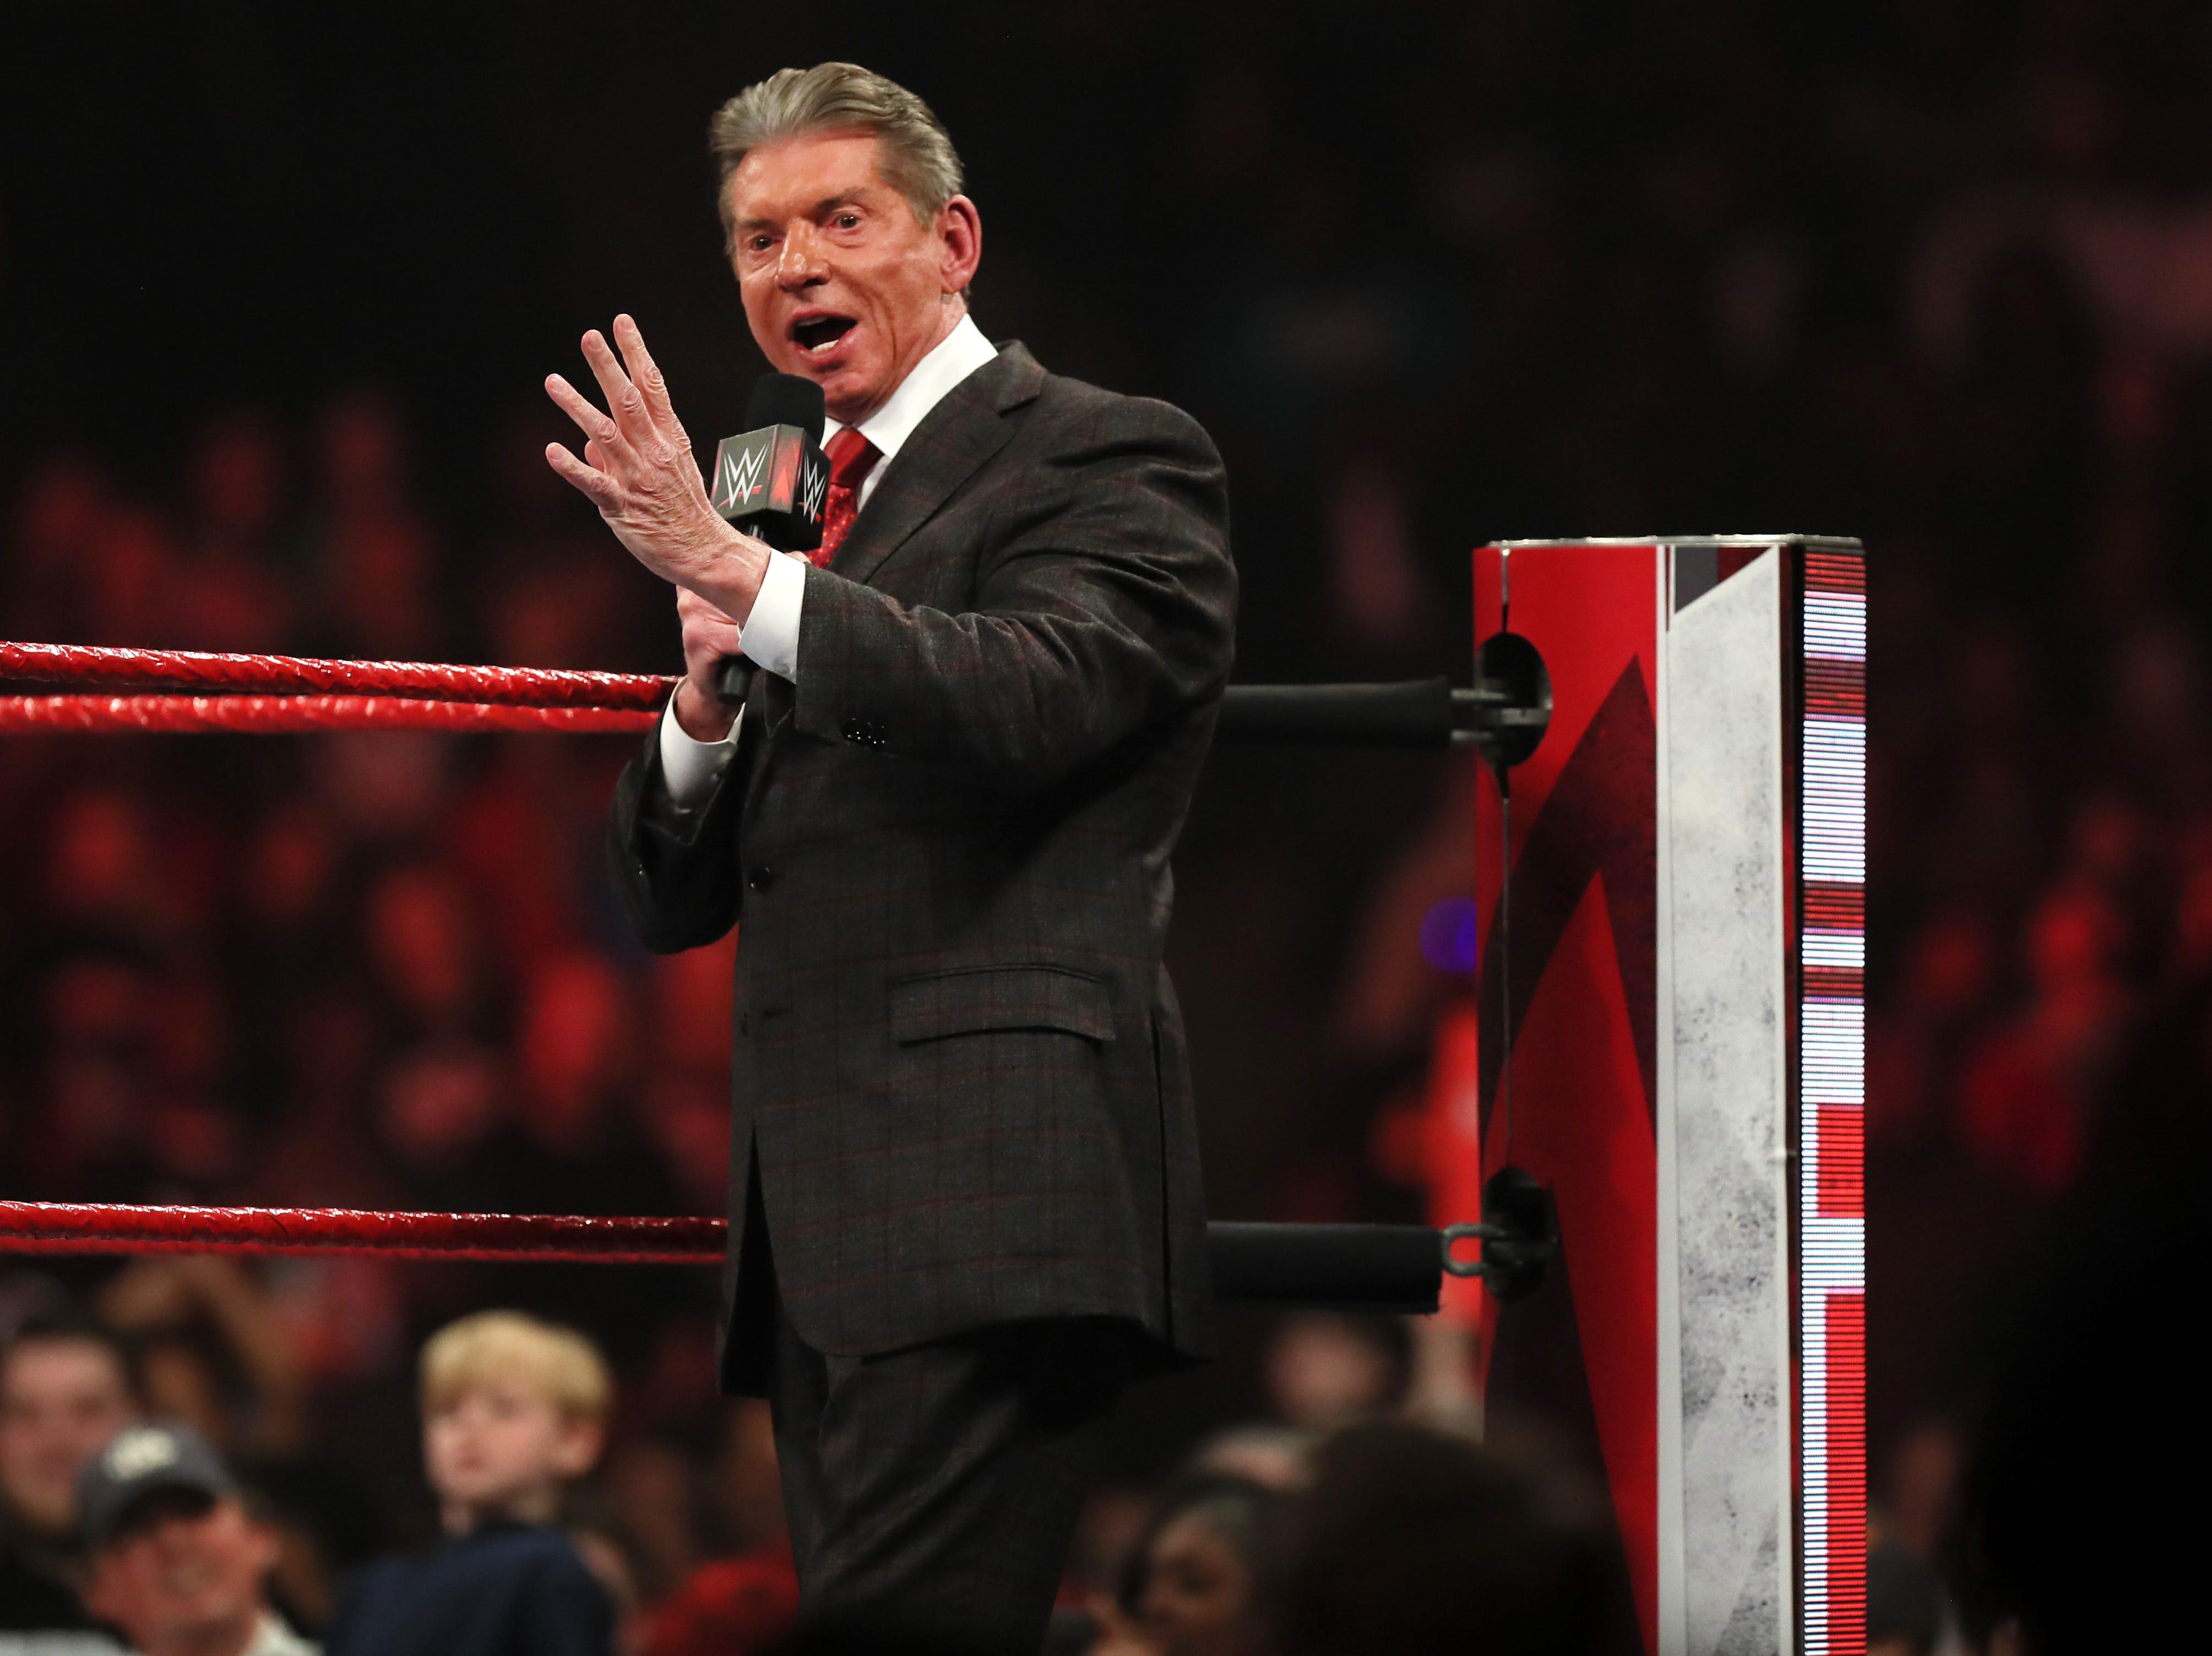 WWE Monday Night Raw at the FedexForum Monday, Jan. 14, 2019.